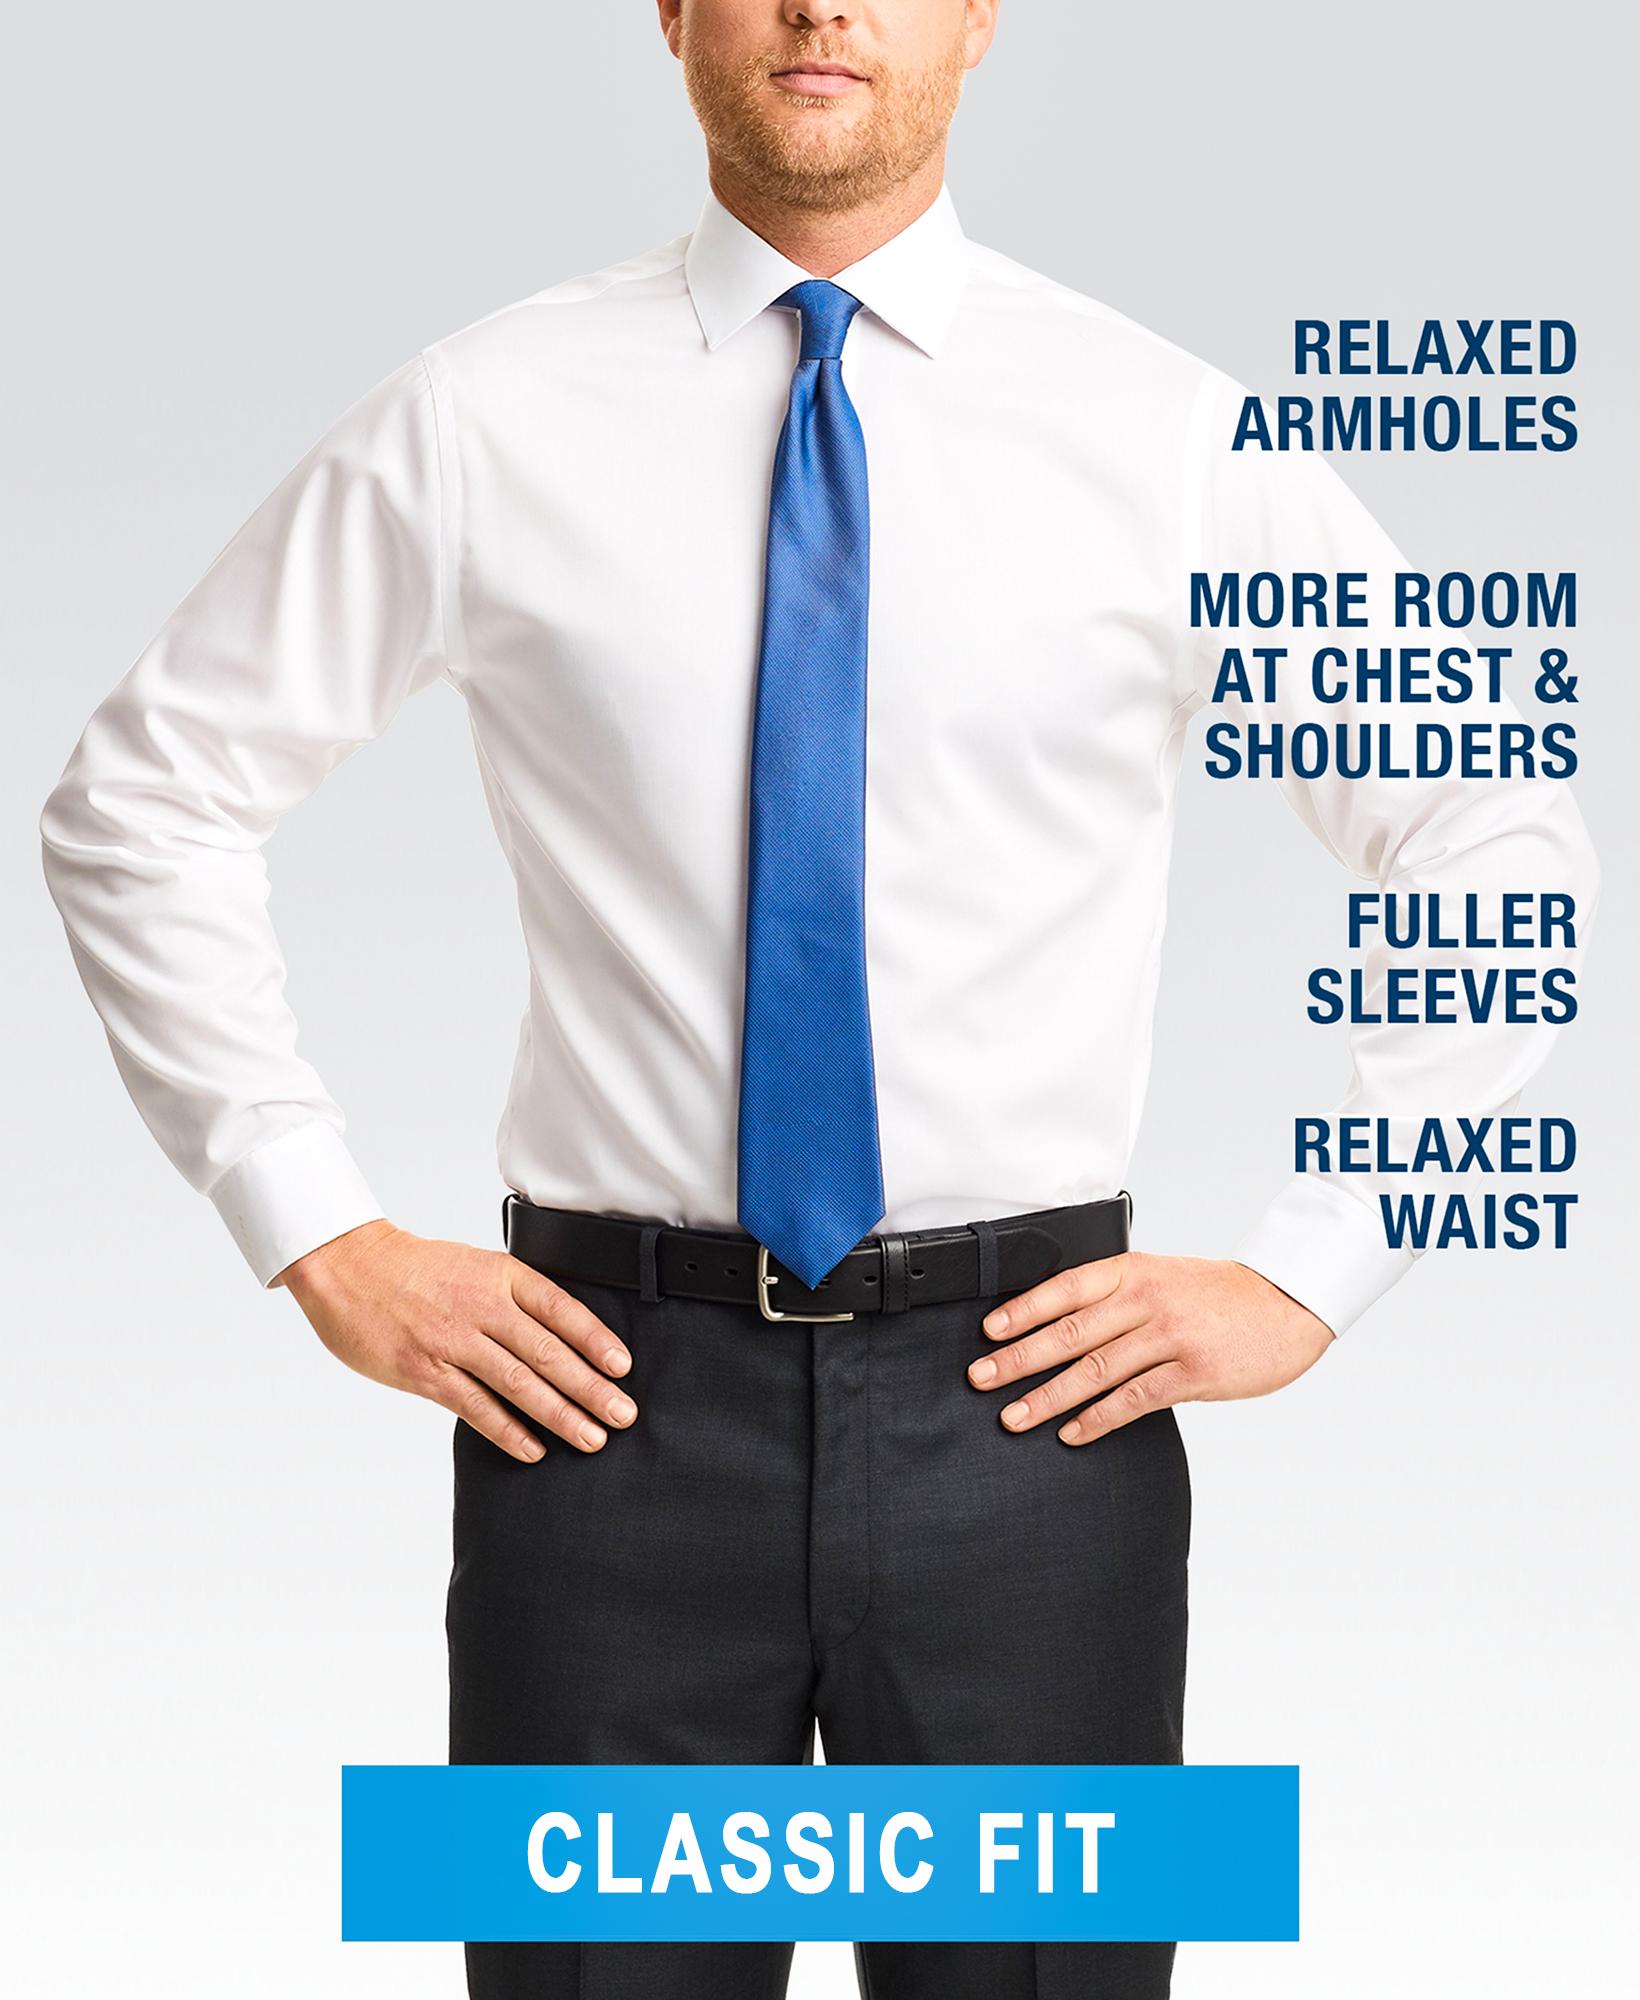 Classic fit dress shirt style